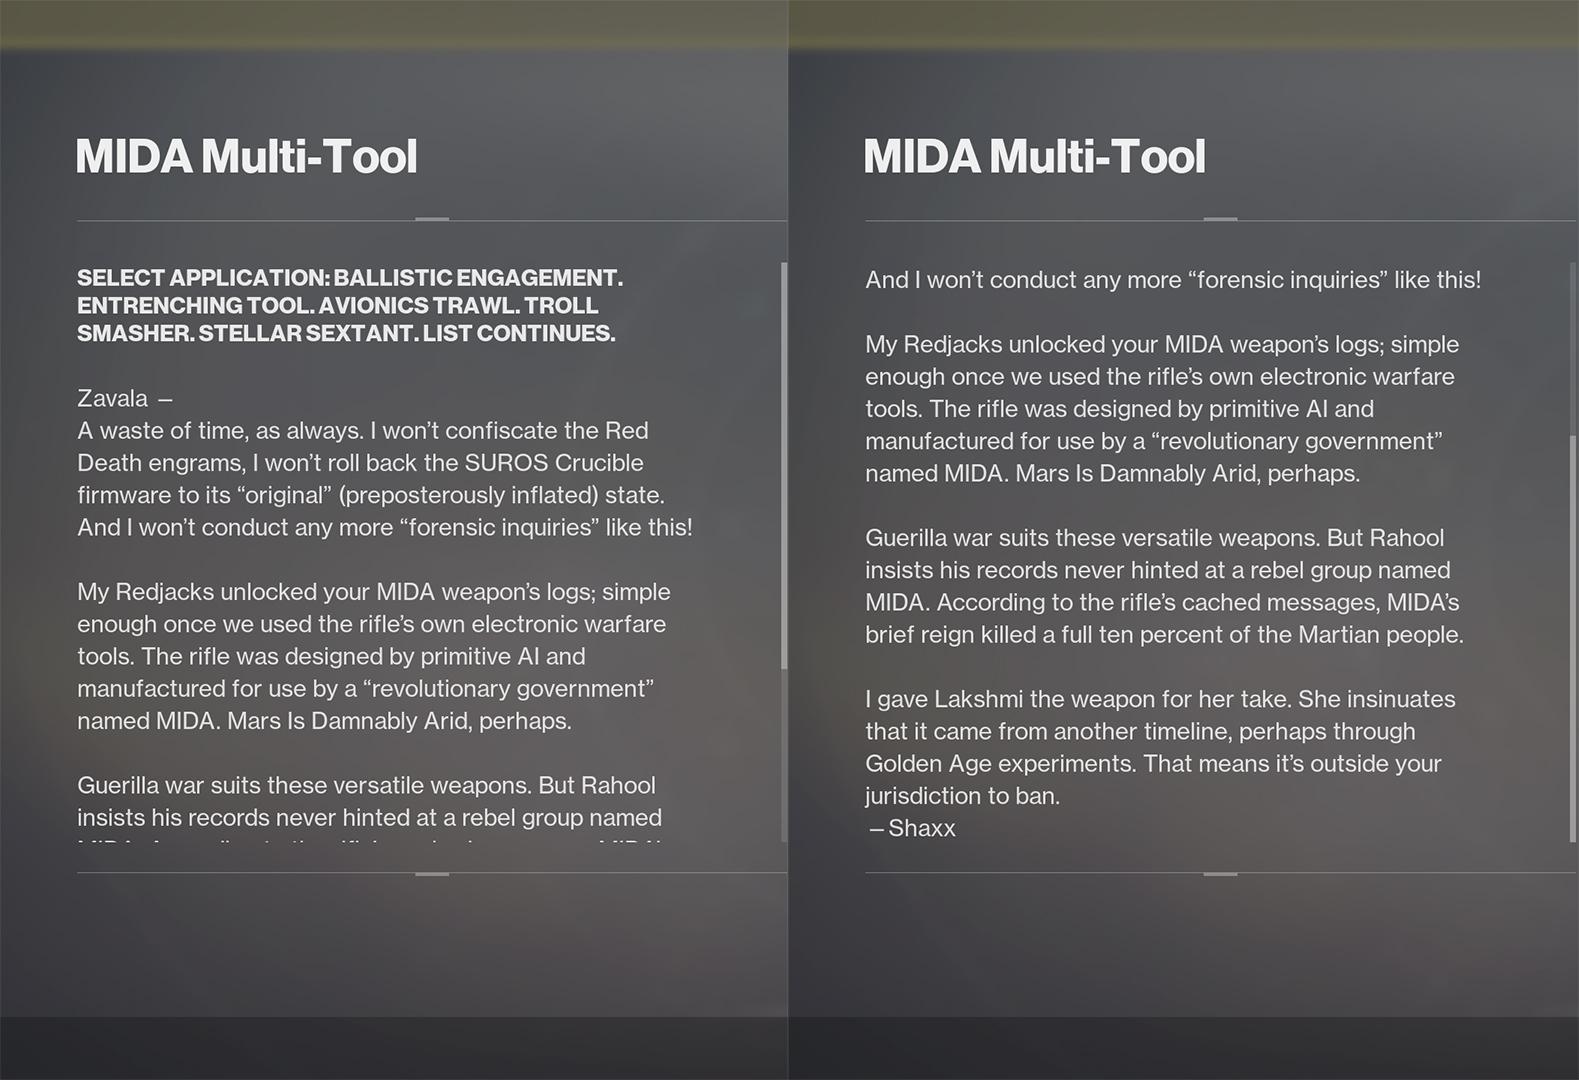 MIDA Multi-Tool lore Destiny 2